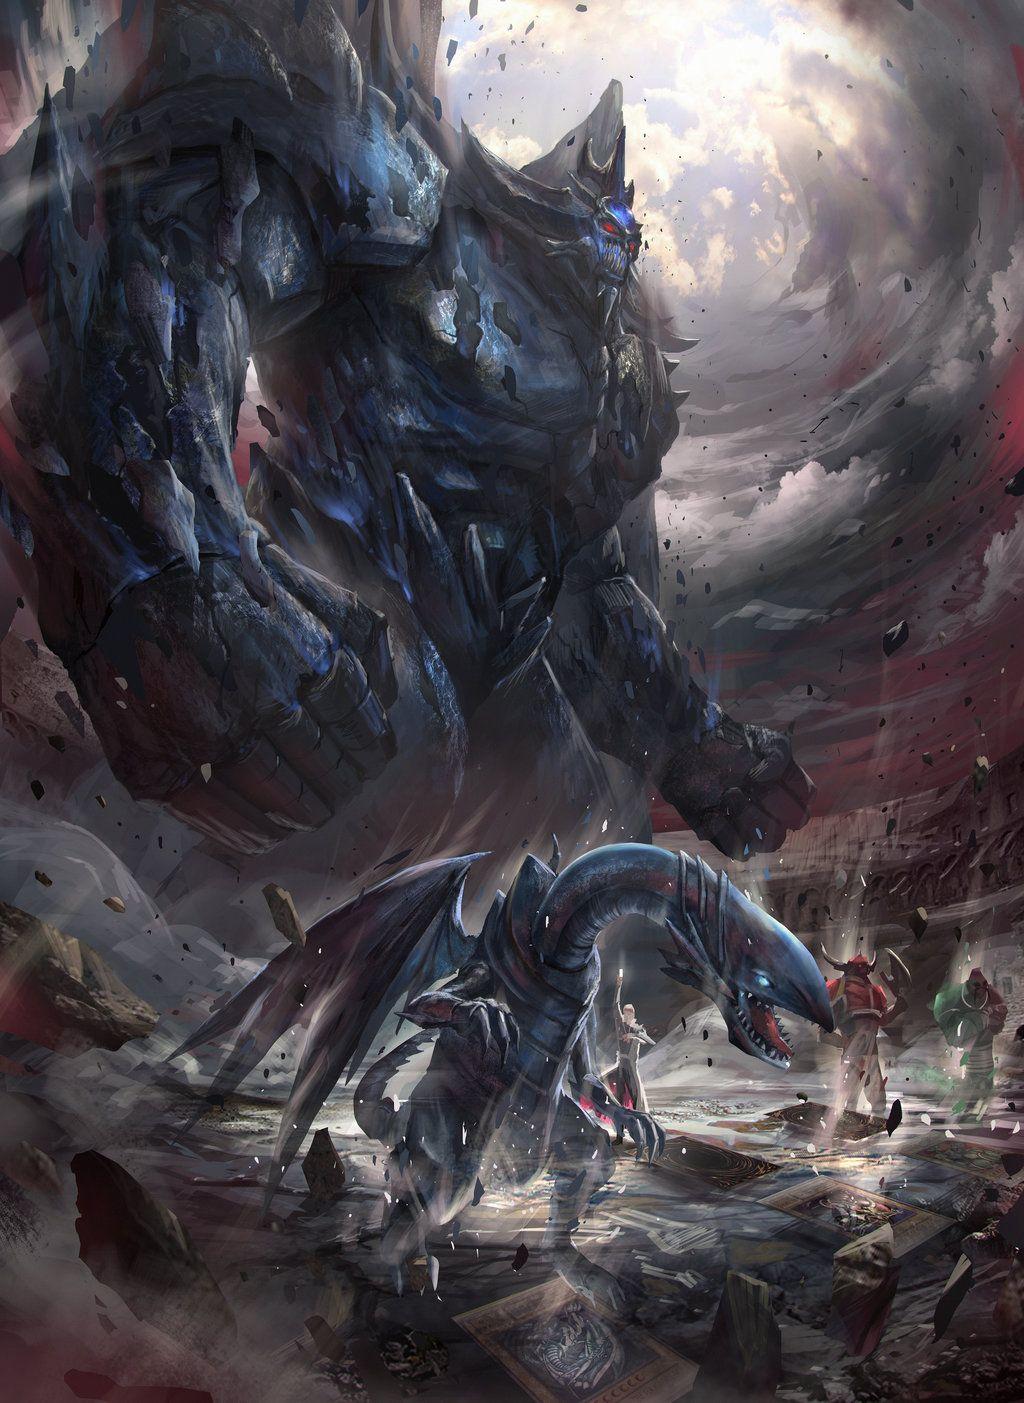 Epic kaiba lineup yugioh monsters obelisk the tormentor